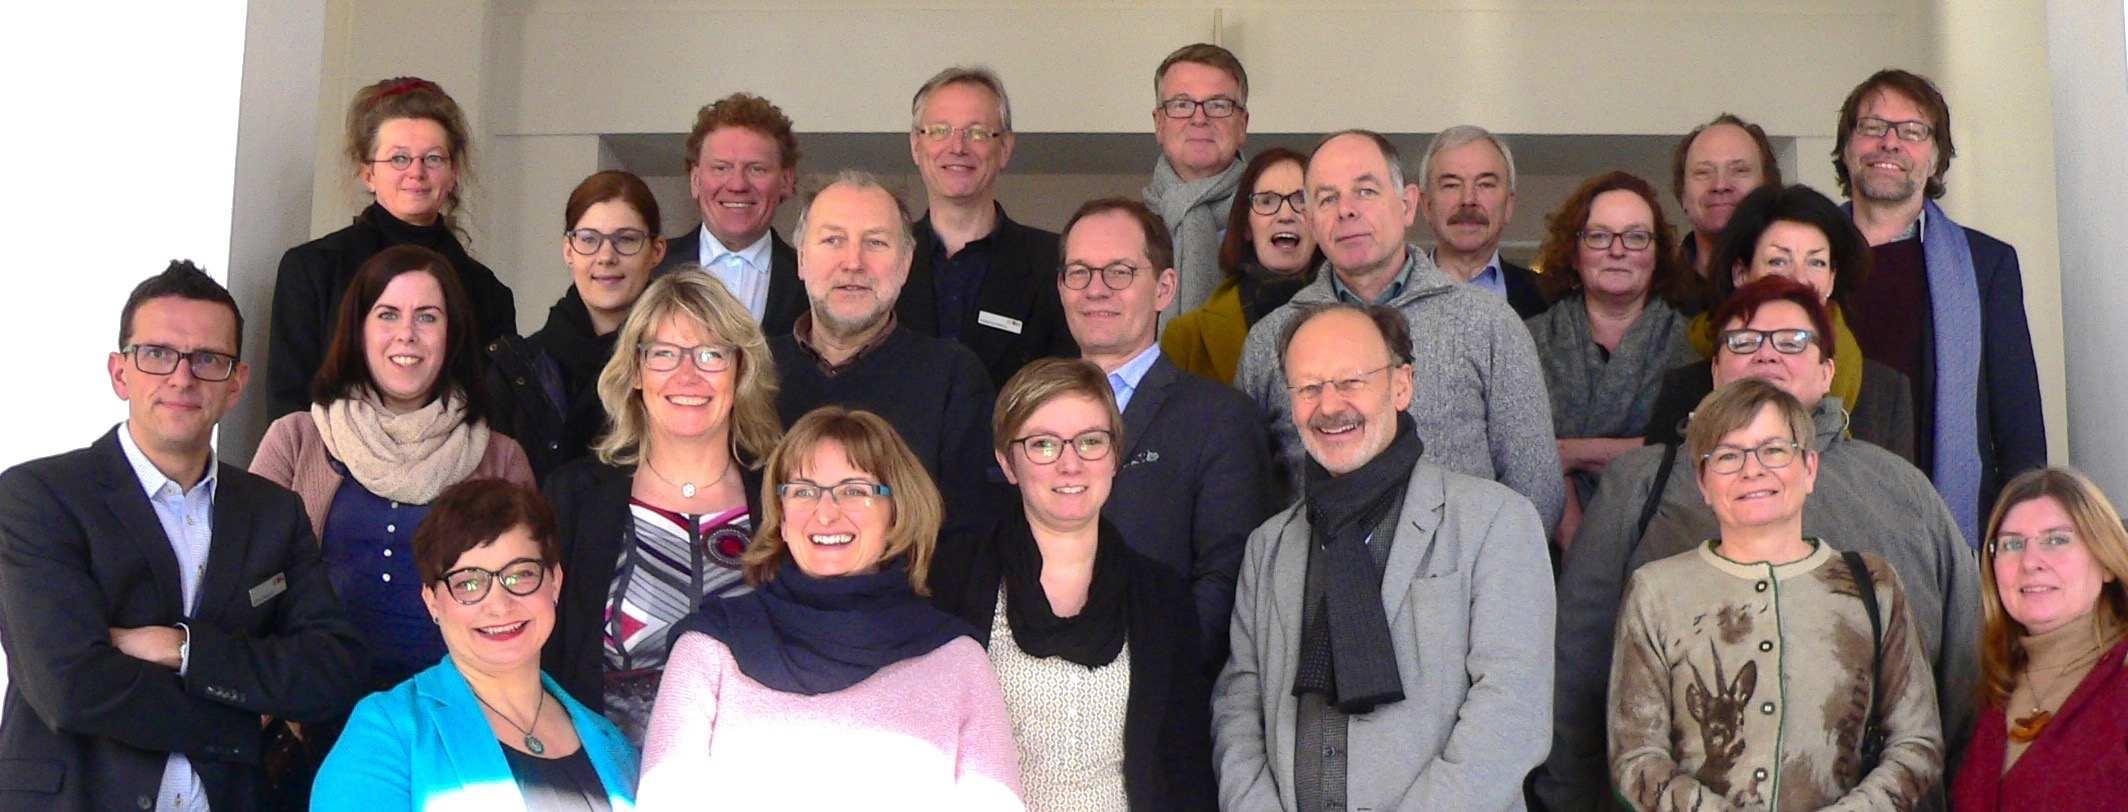 Netzwerktreffen Kulturplanung – Kulturagenda 2018